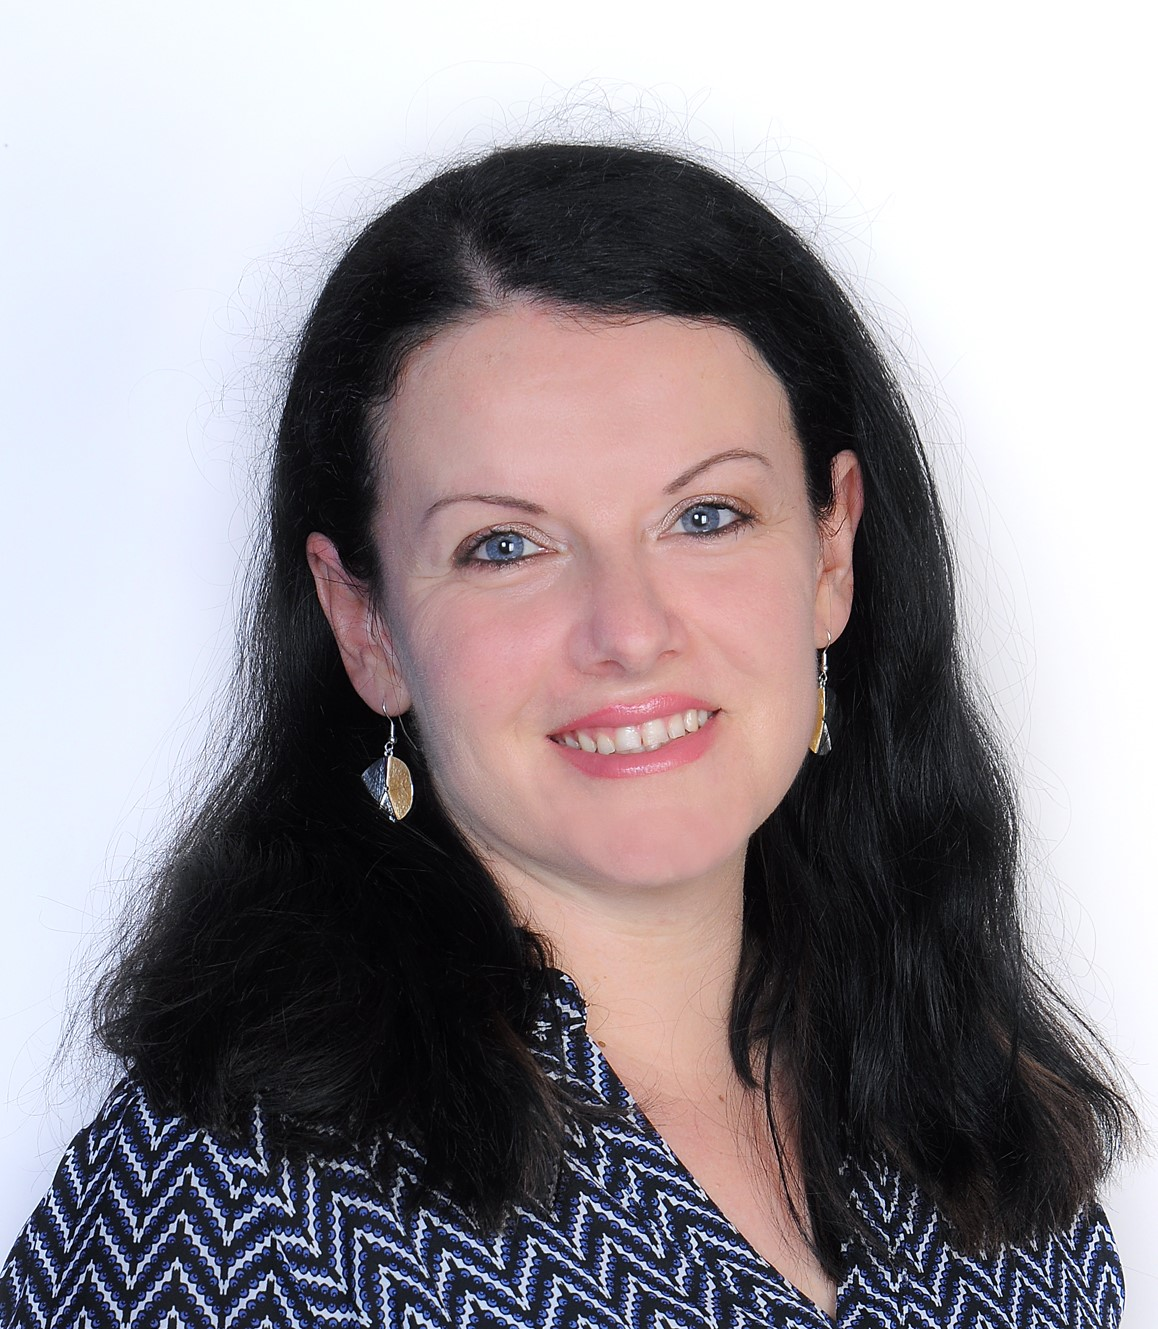 Laura Kokot